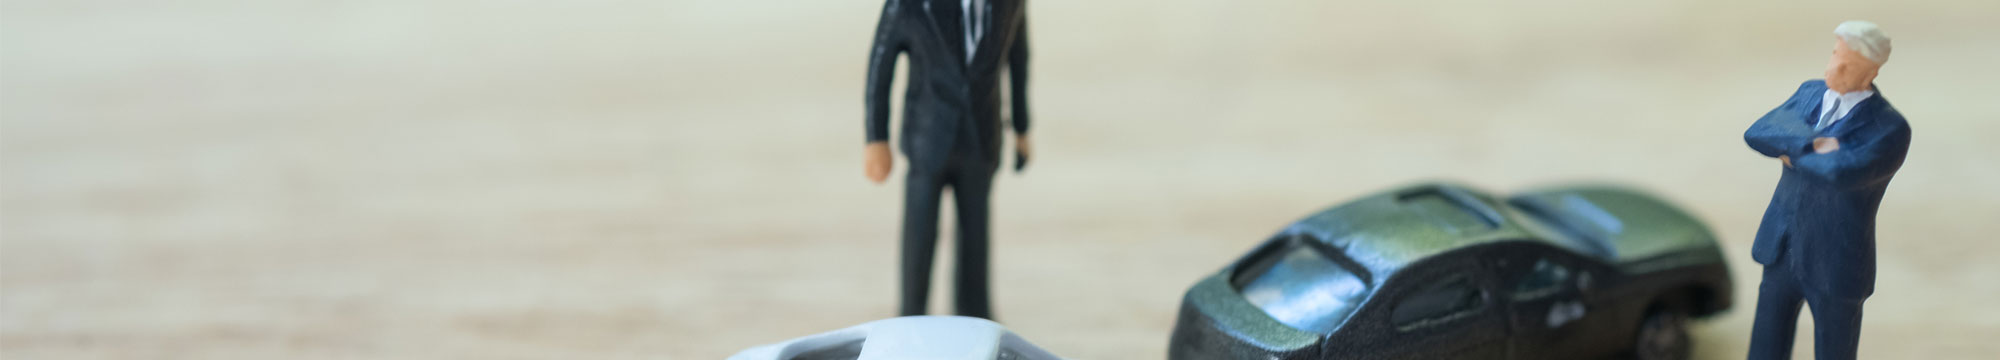 Assegurança de cotxe a tercers - Medicorasse